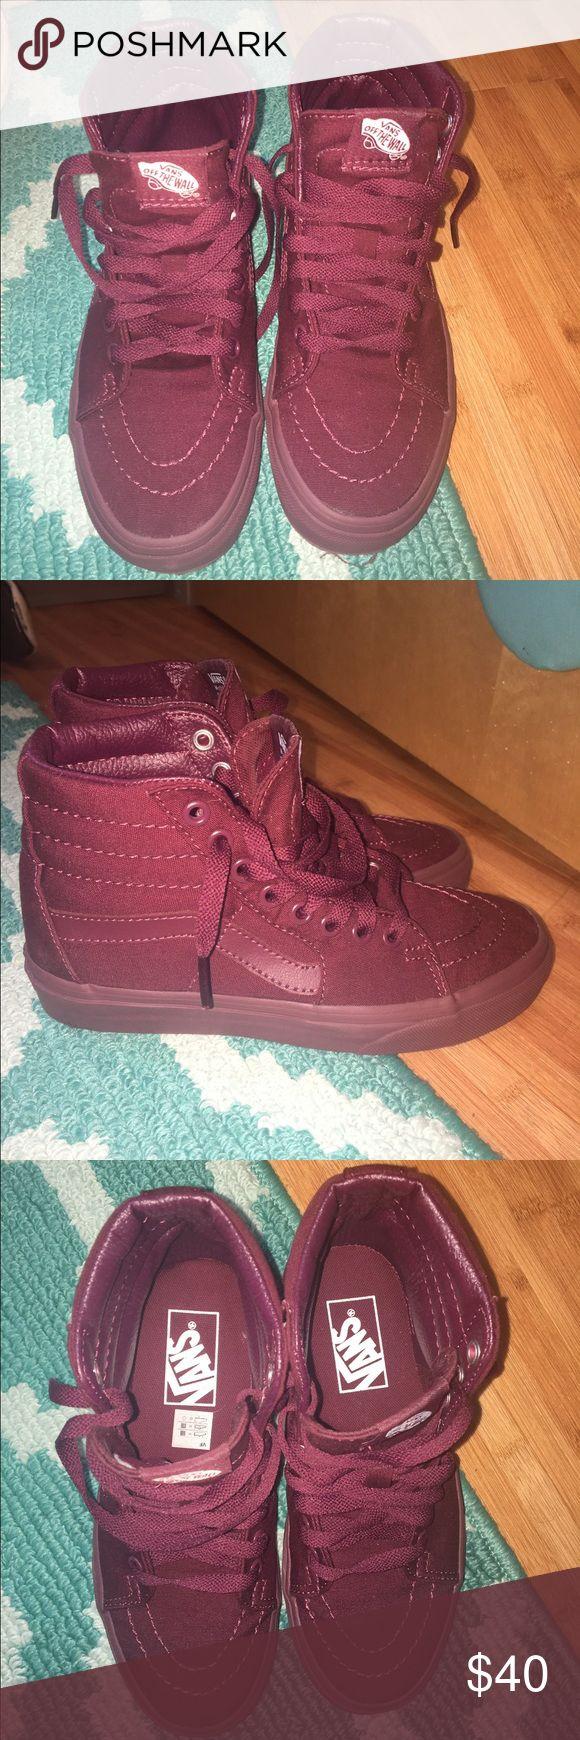 Maroon High Top Vans Maroon canvas high top Vans. Never worn. Vans Shoes Sneakers